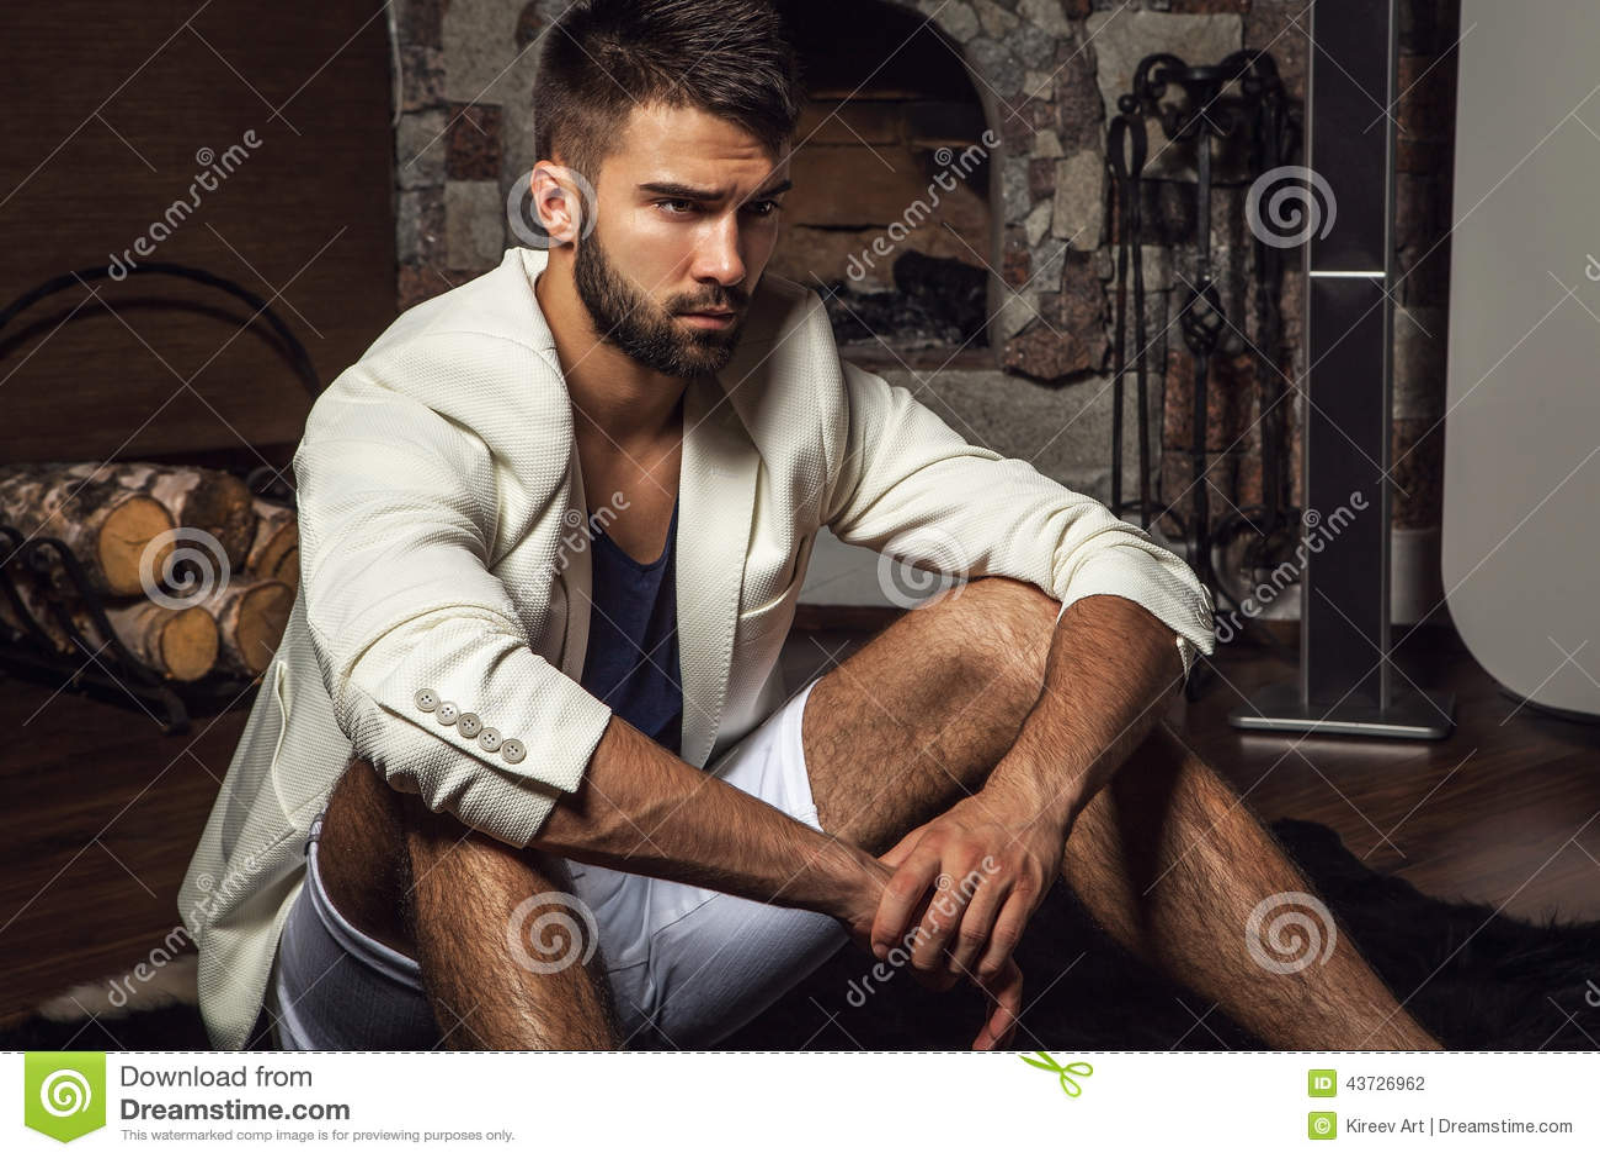 naked sexy beard man